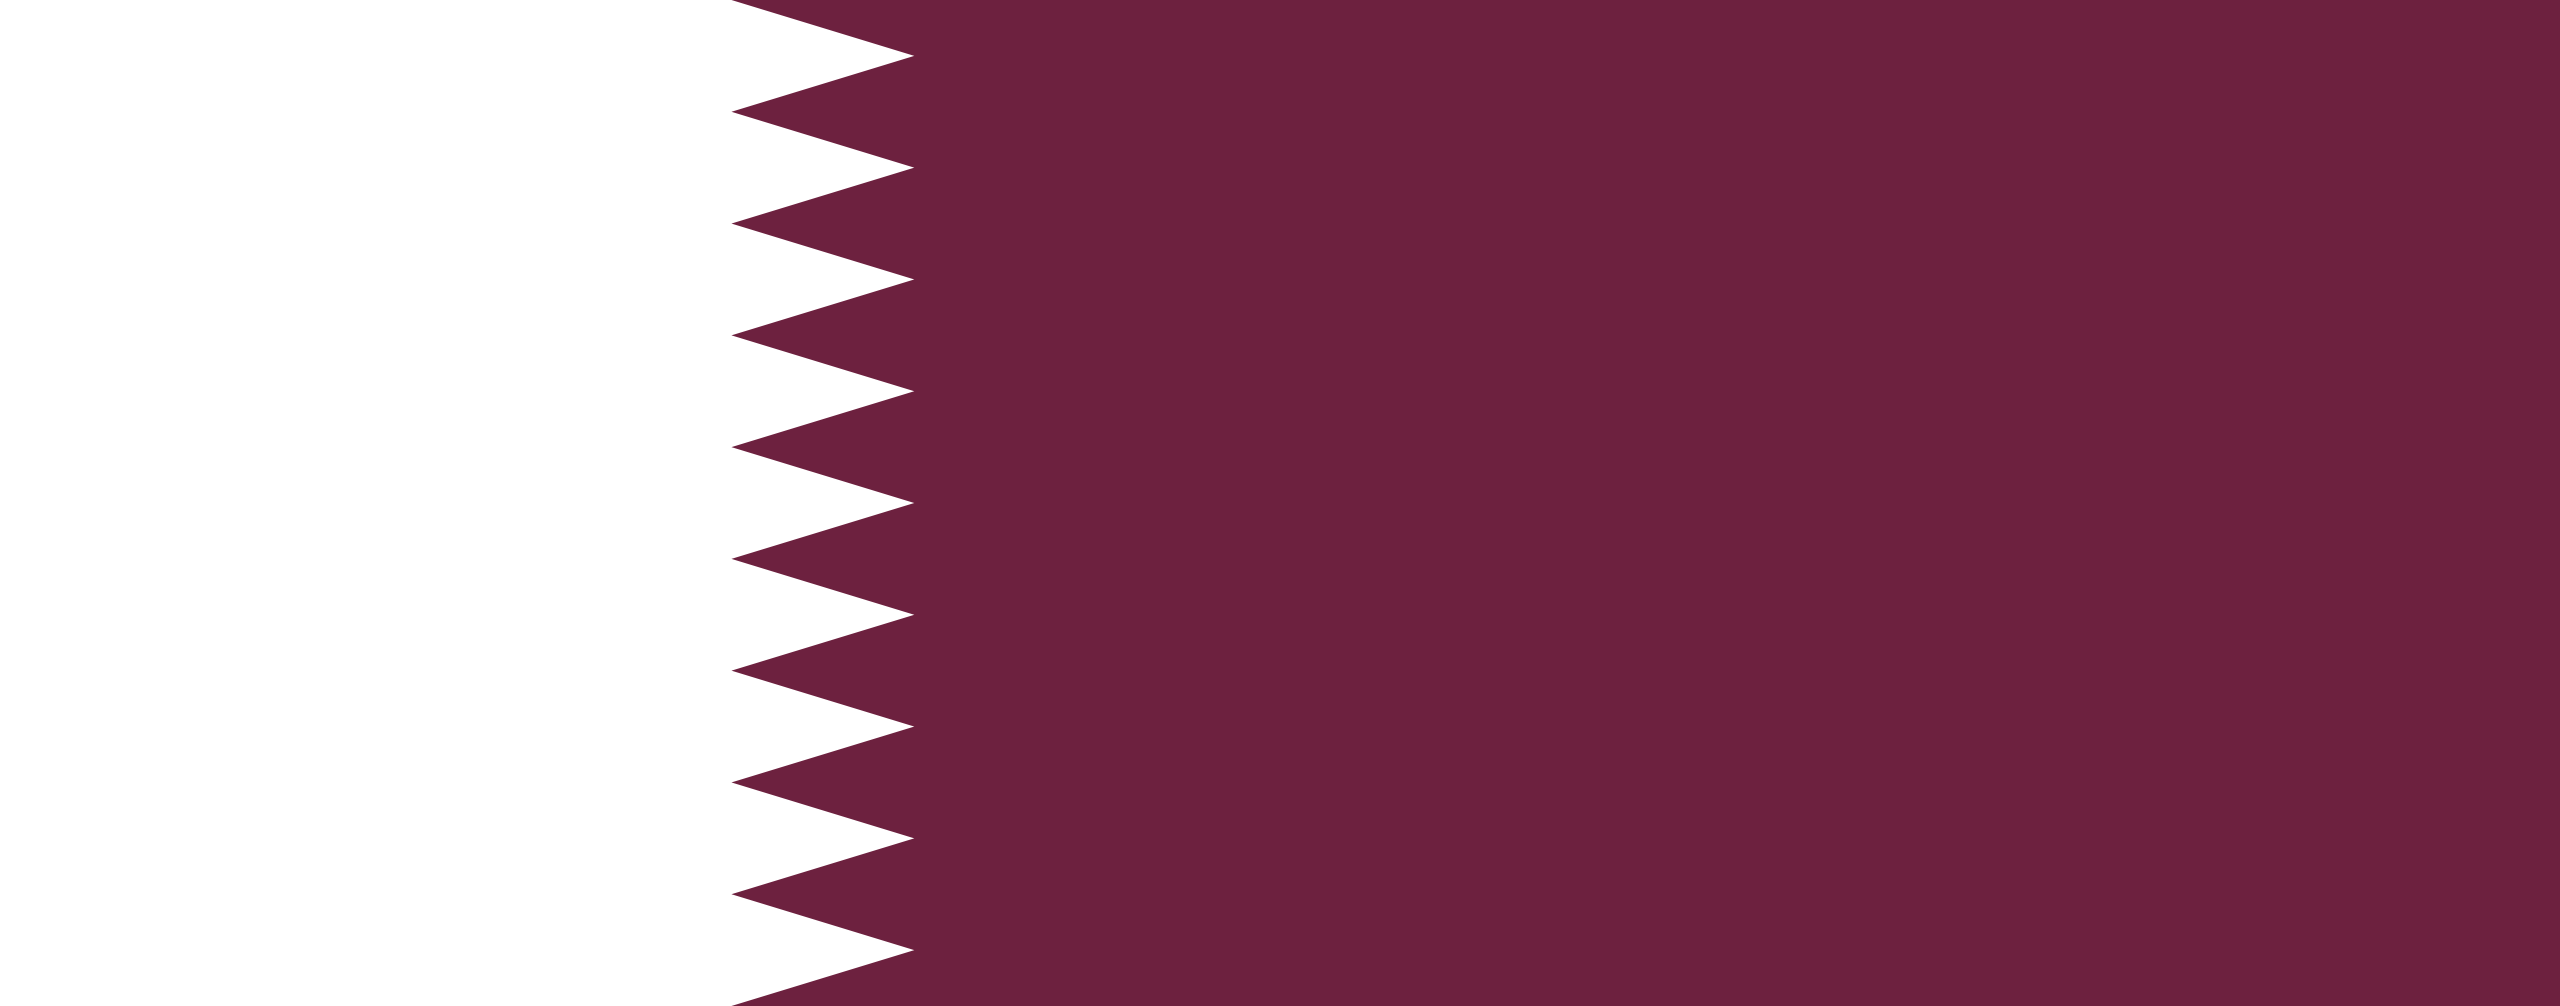 qatar, страна, Эмблема, логотип, символ - Обои HD - Профессор falken.com